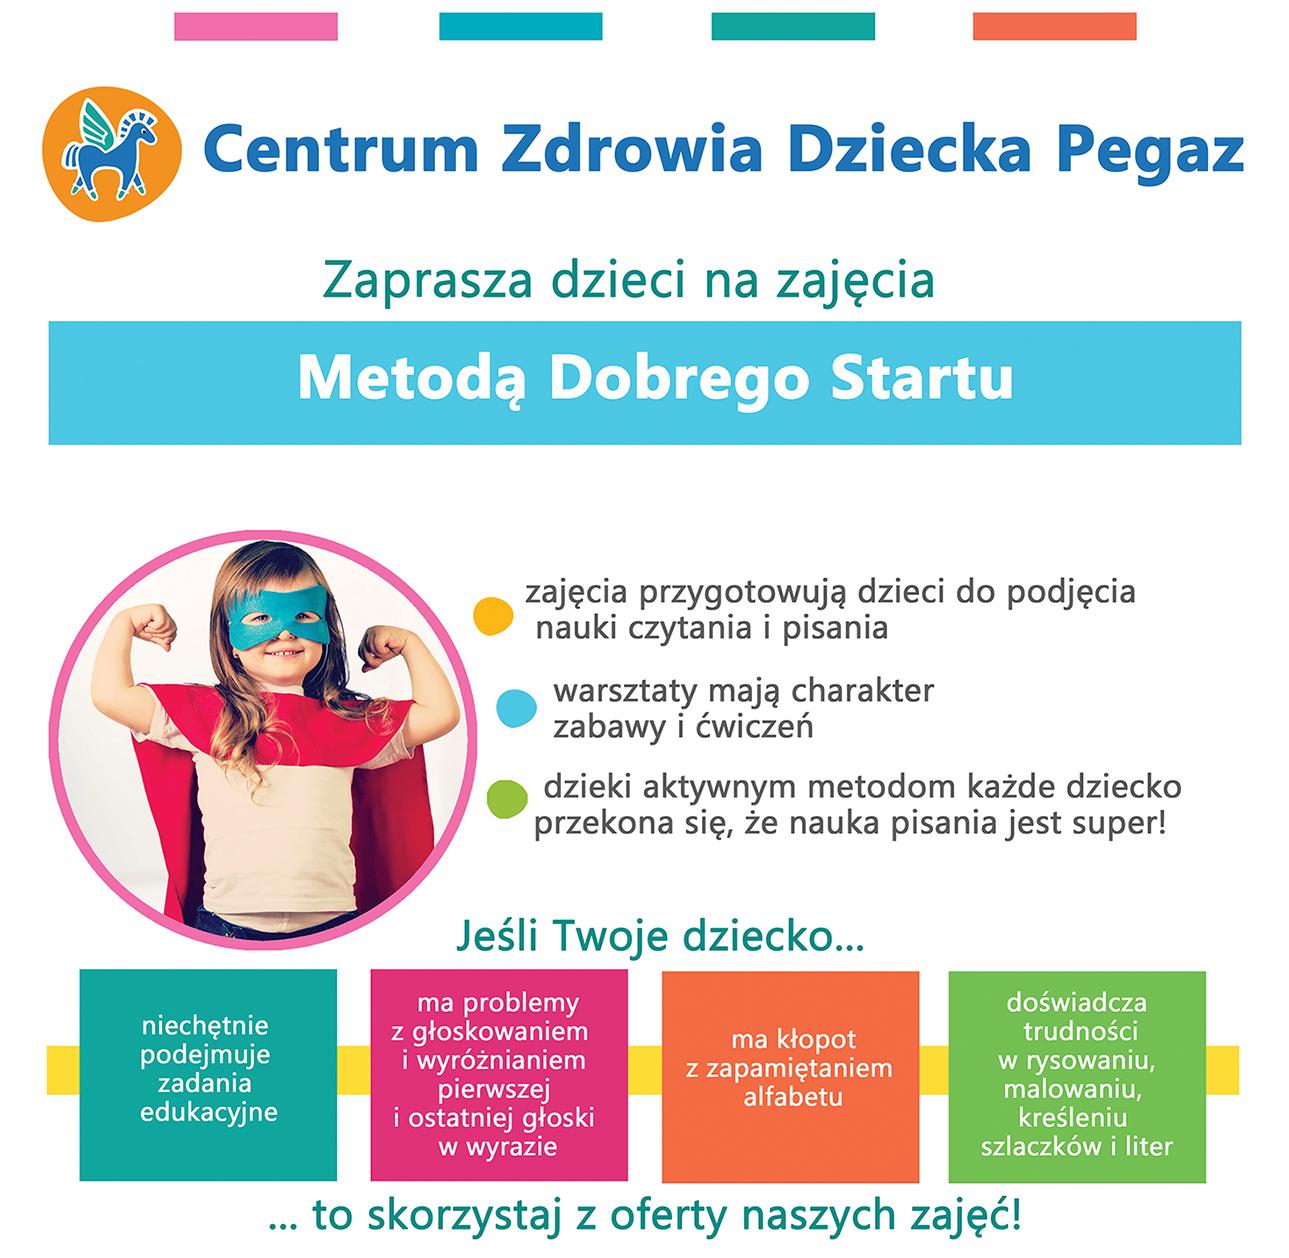 Metoda Dobrego Startu poradnia pegaz Gdańsk Gdynia Rumia Banino Słupsk